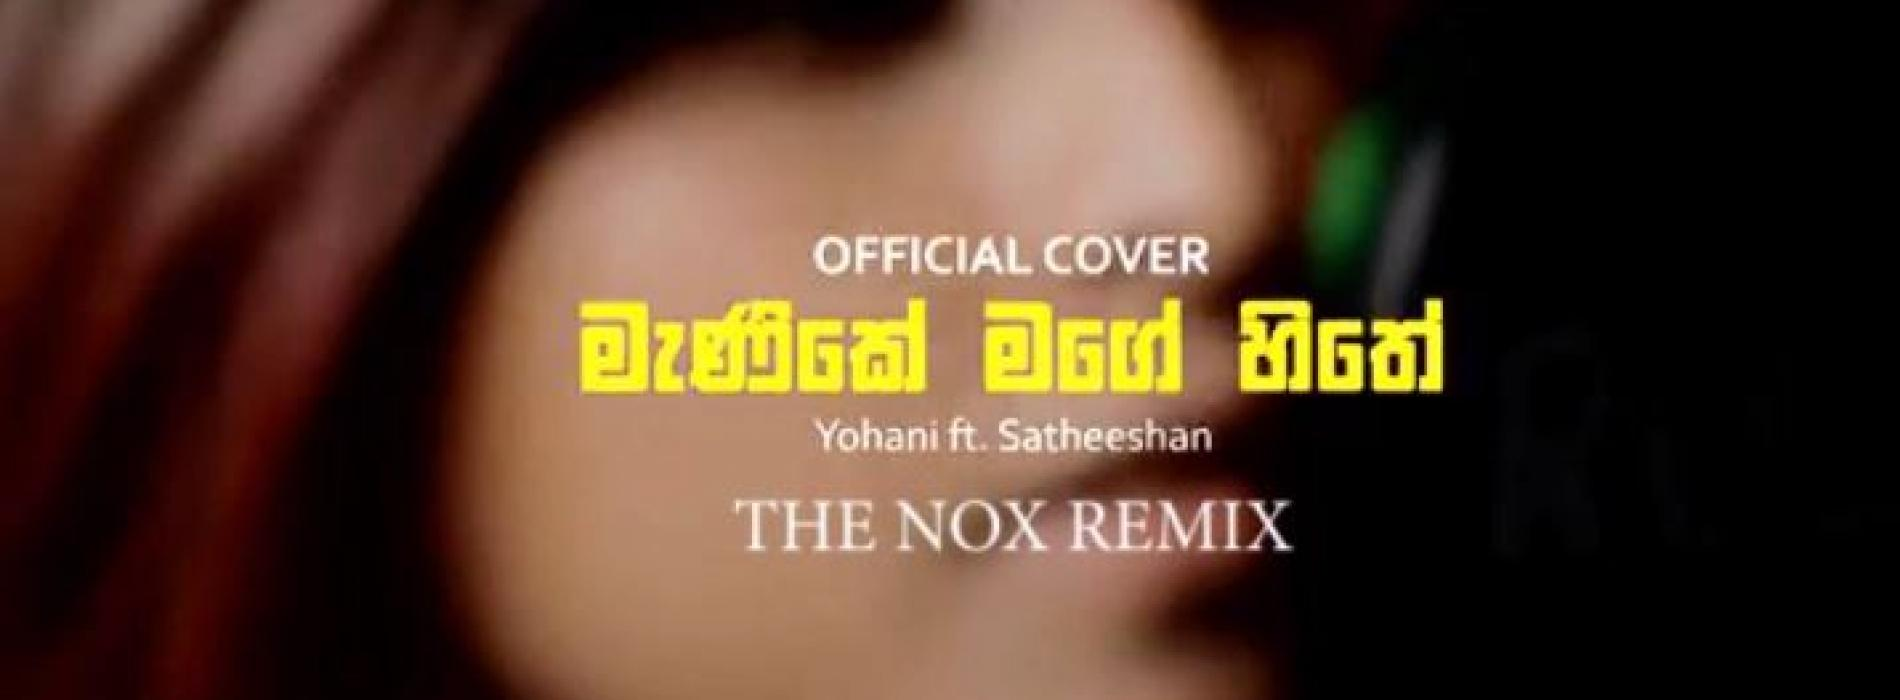 New Music : Manike Mage Hithe මැණිකේ මගේ හිතේ Official Cover Yohani & Satheeshan (The Nox Remix)